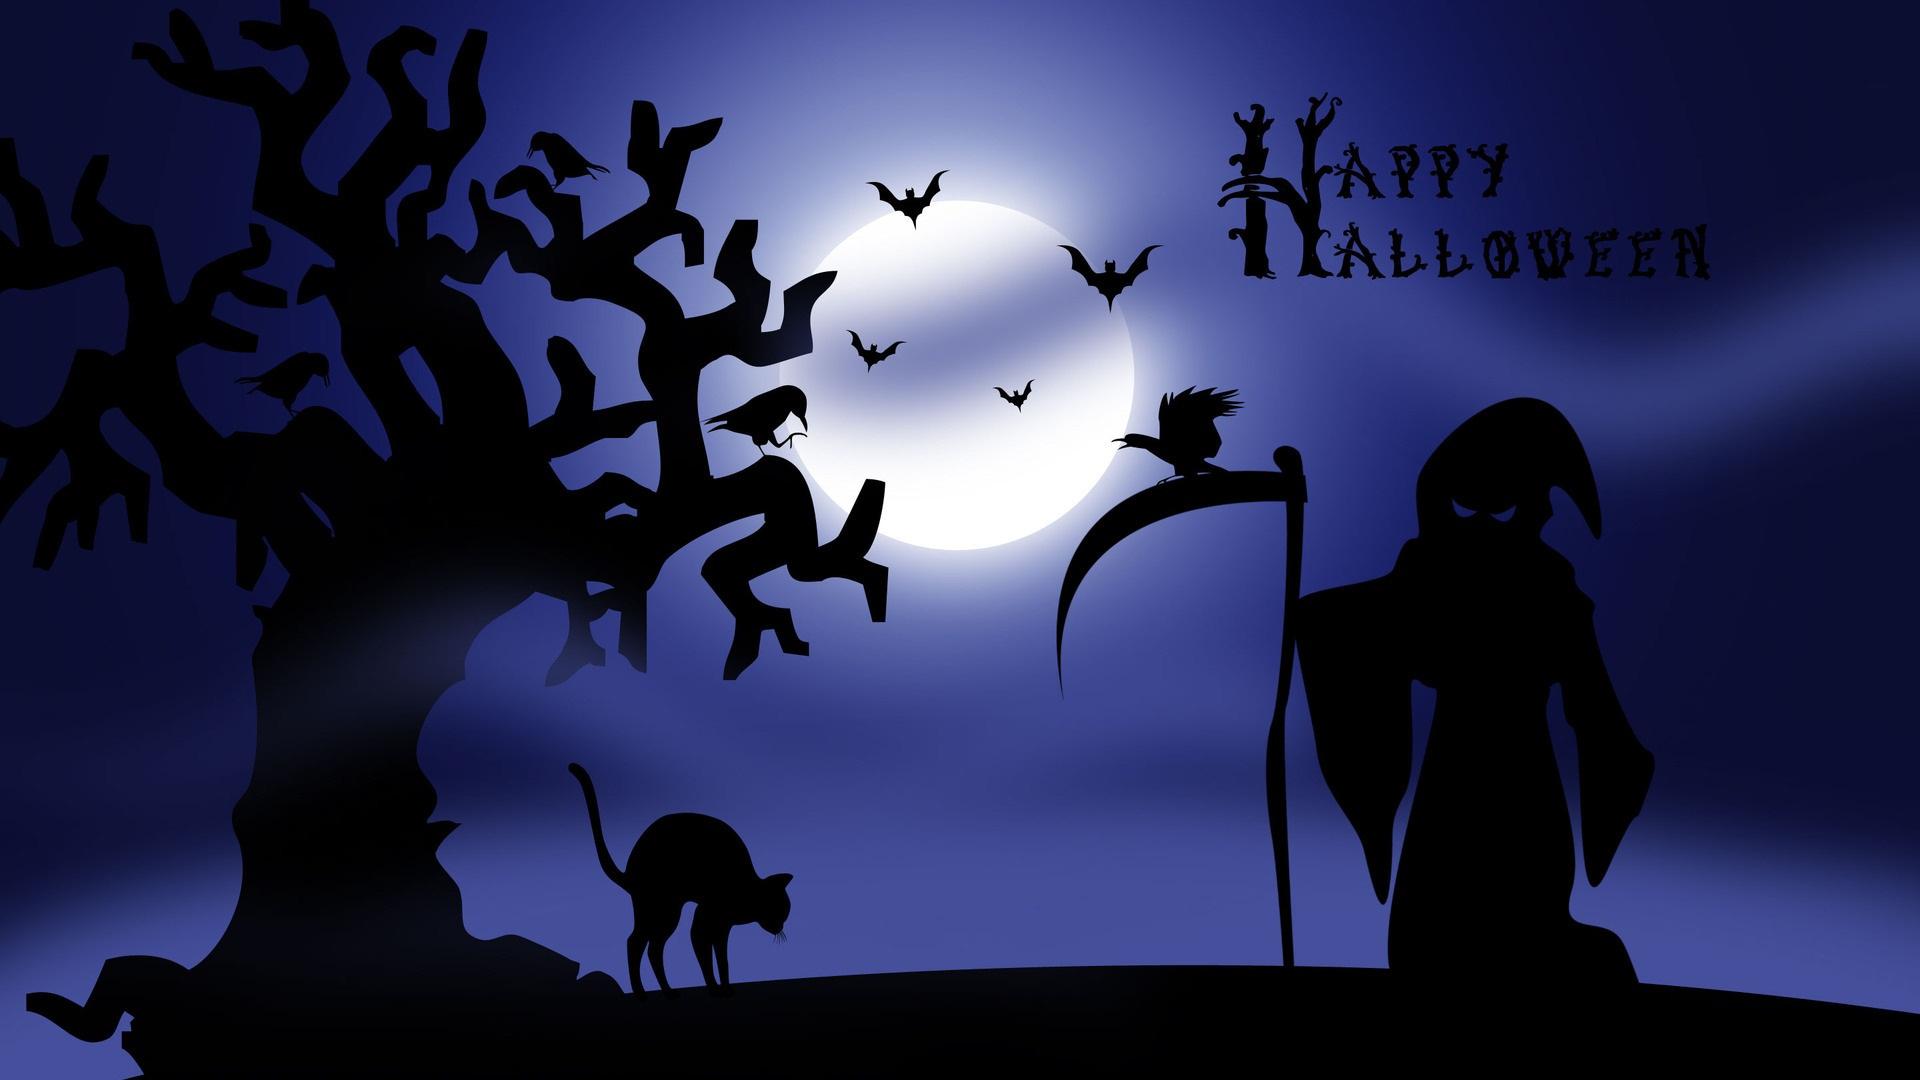 Happy-Halloween-scary-wallpaper